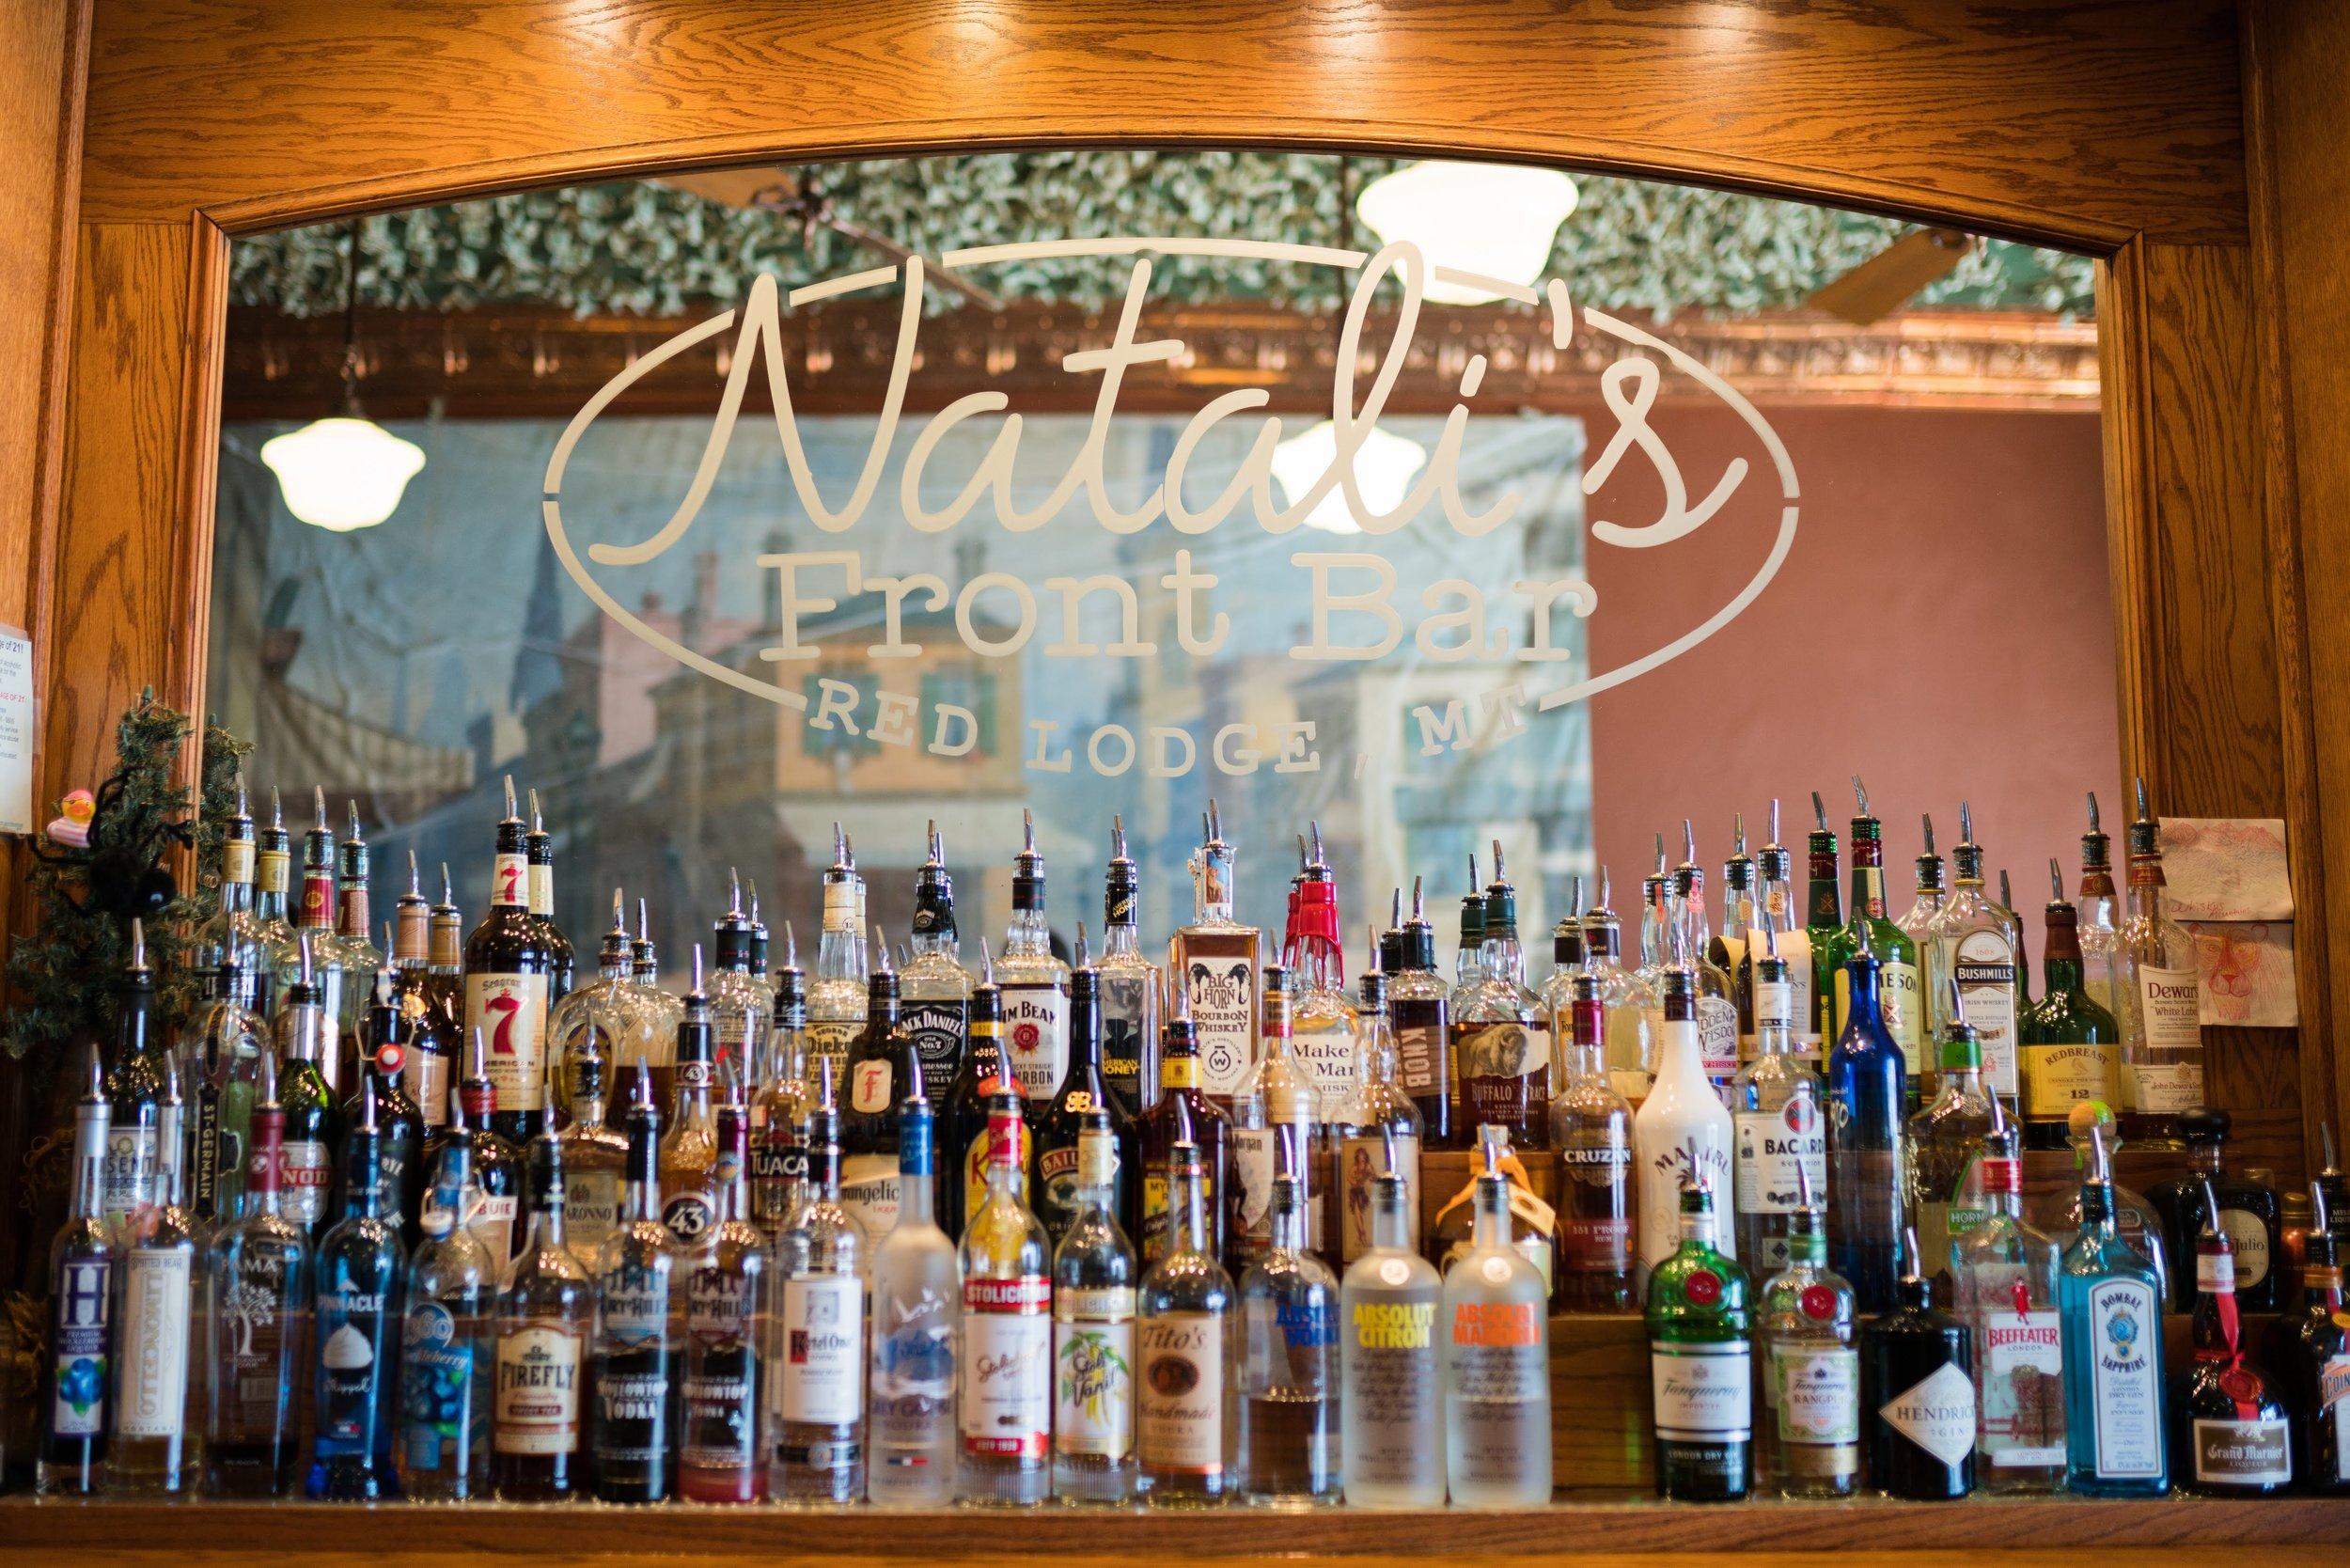 - Natali's Front Bar